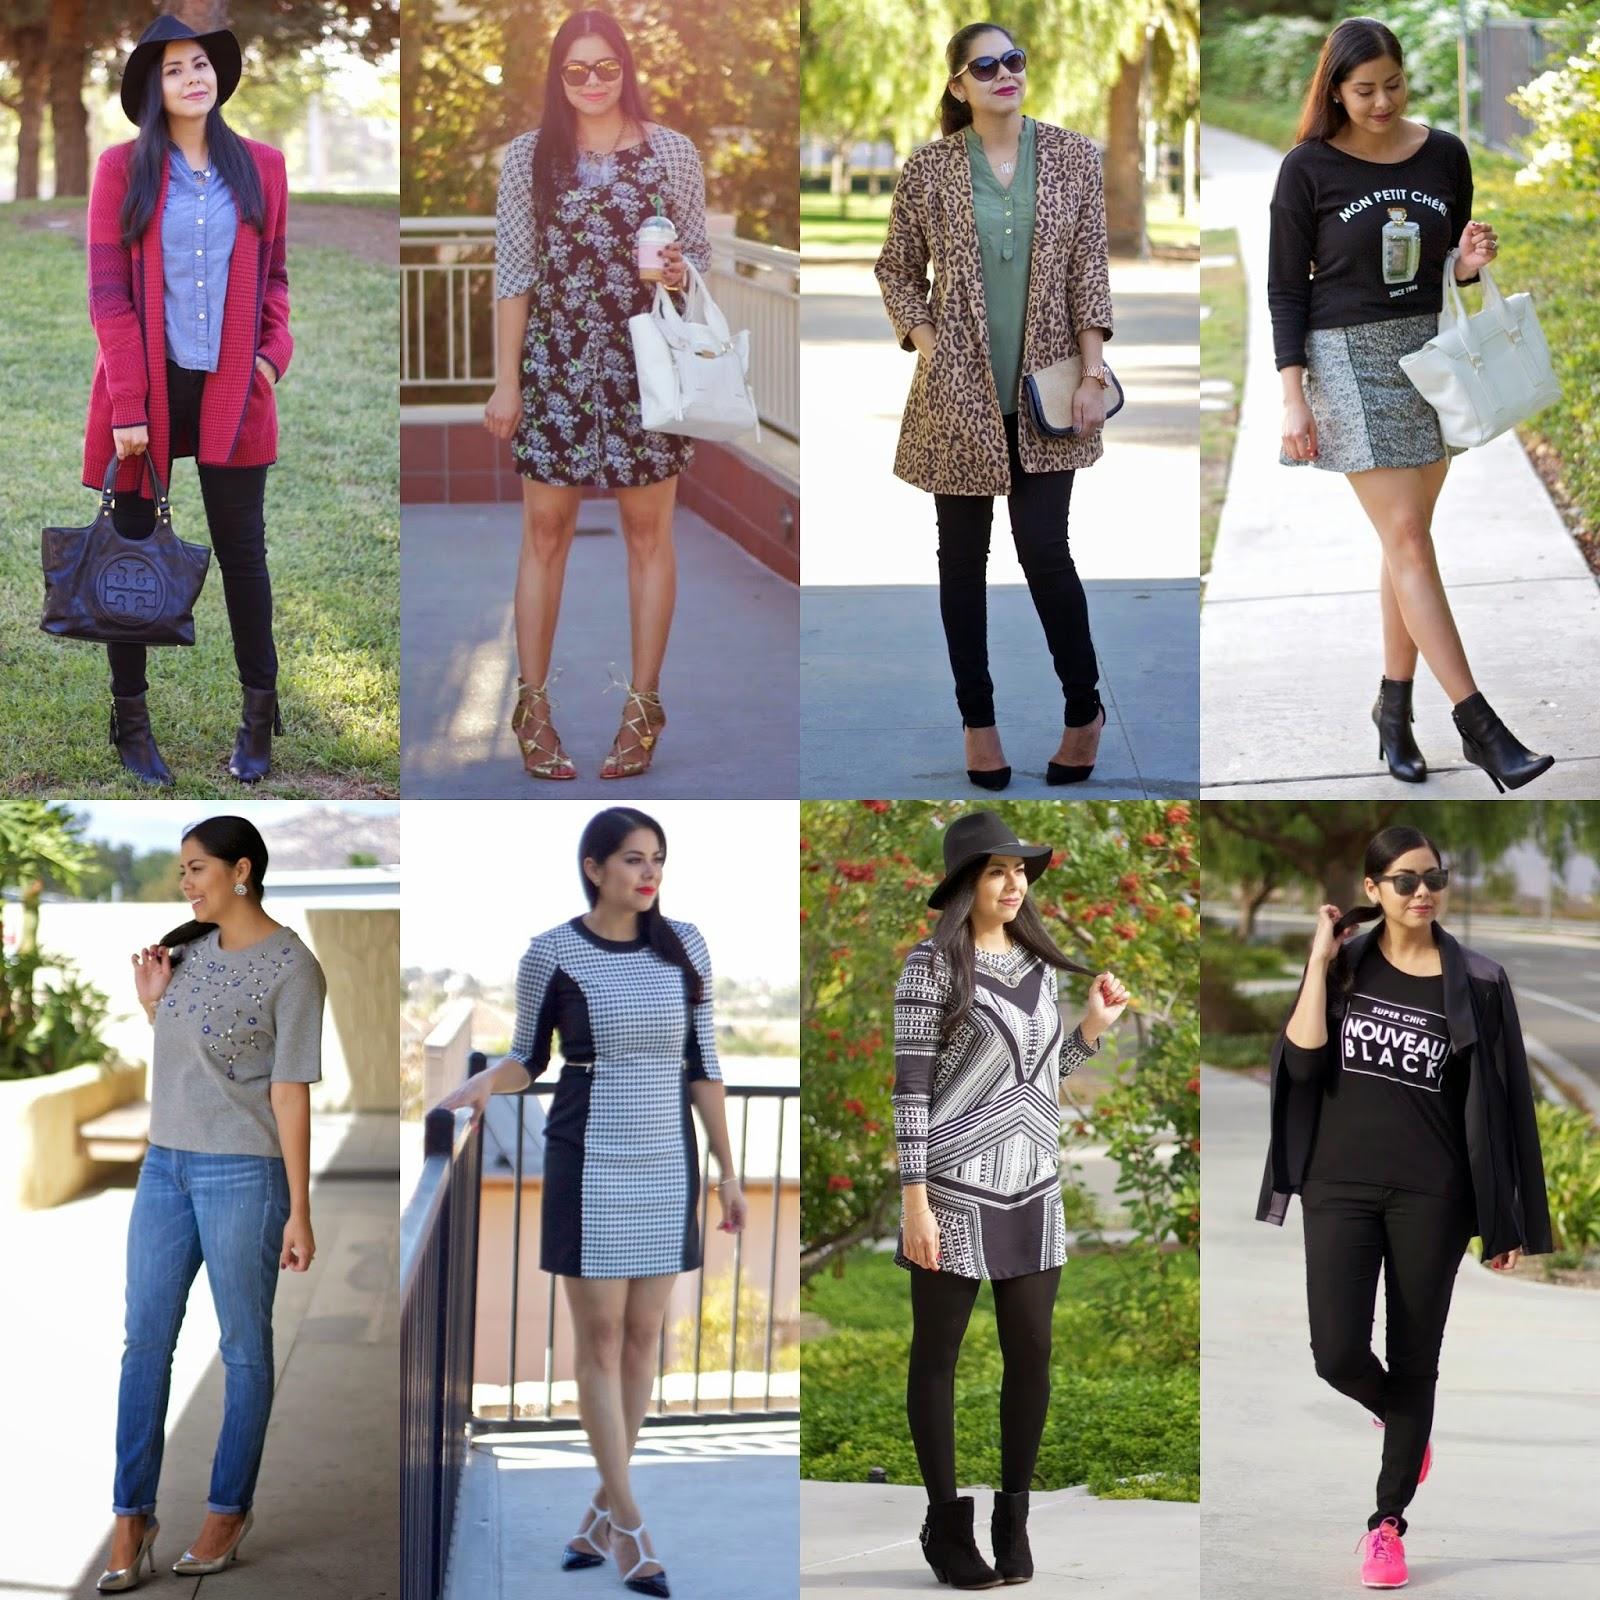 ff8fd4213c98b outfit recap, october 2014 outfit recap, san diego blogger, san diego  fashion blogger Pin ...